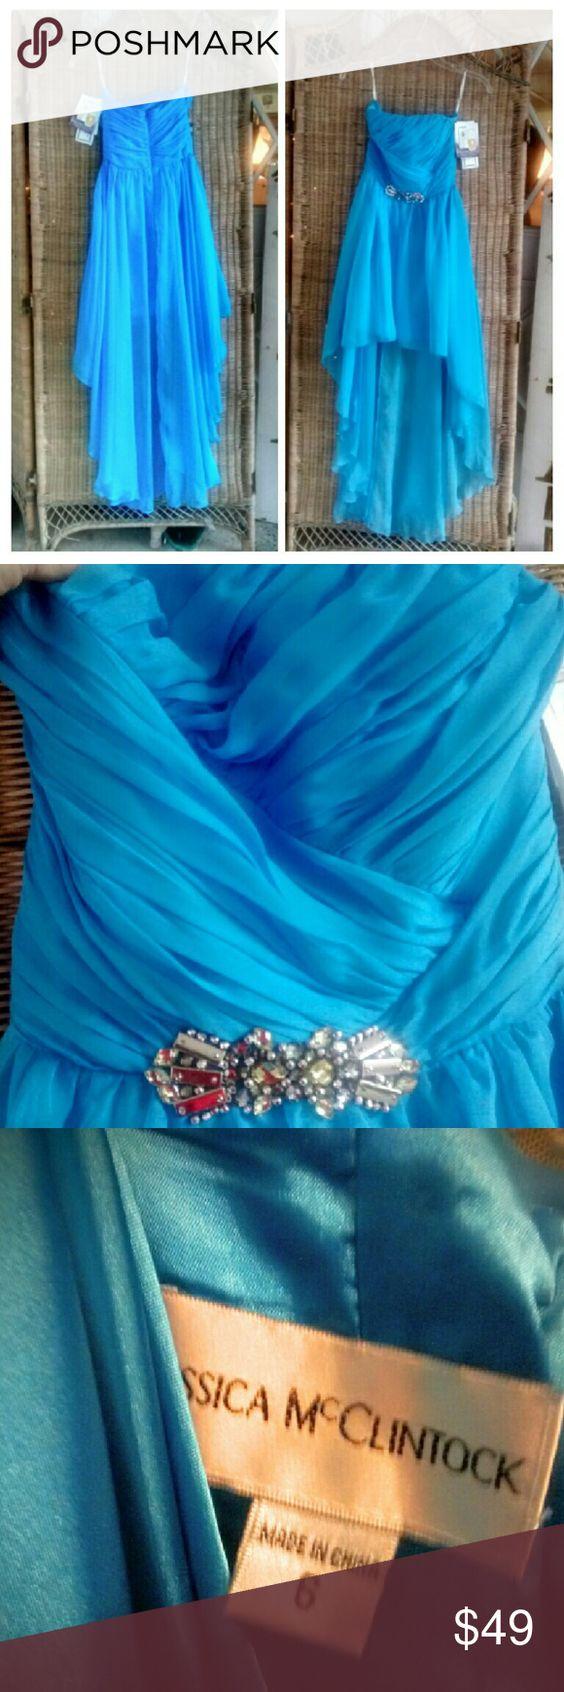 Jessica McClintock NWT Prom Dress Peacock blue hi lo dress from Jessica McClintock. NWT for 169.00. Never even tried on. Size 6. Jessica McClintock Dresses Prom